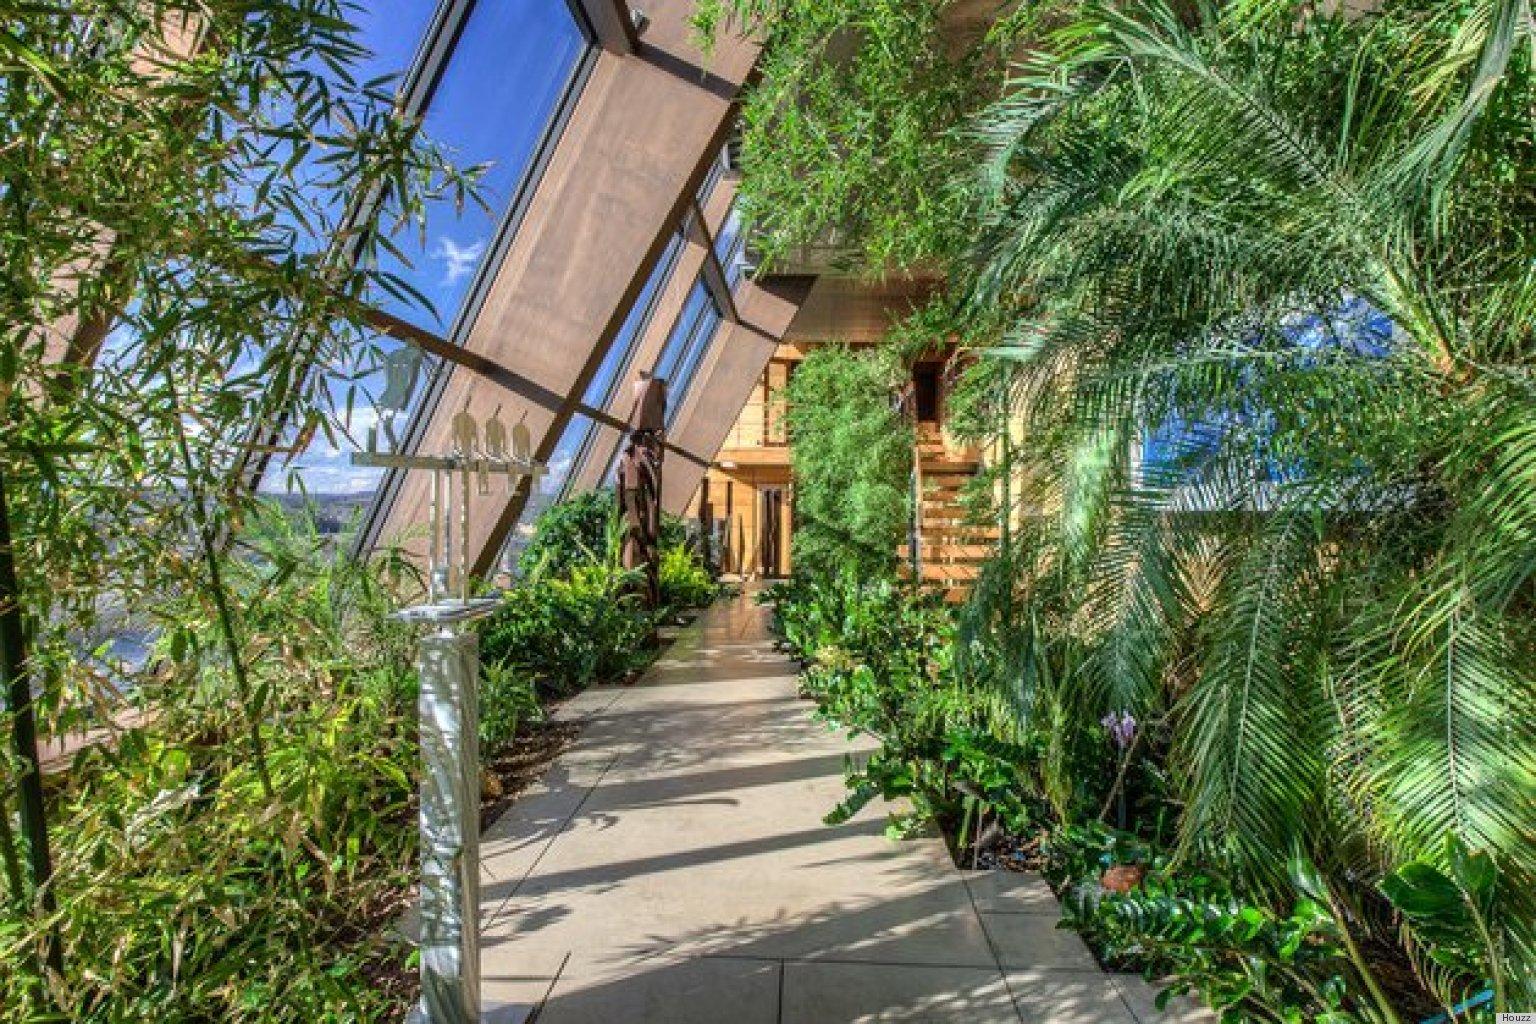 10 indoor gardens that definitely bring the outdoors in photos 10 indoor gardens that definitely bring the outdoors in photos huffpost workwithnaturefo